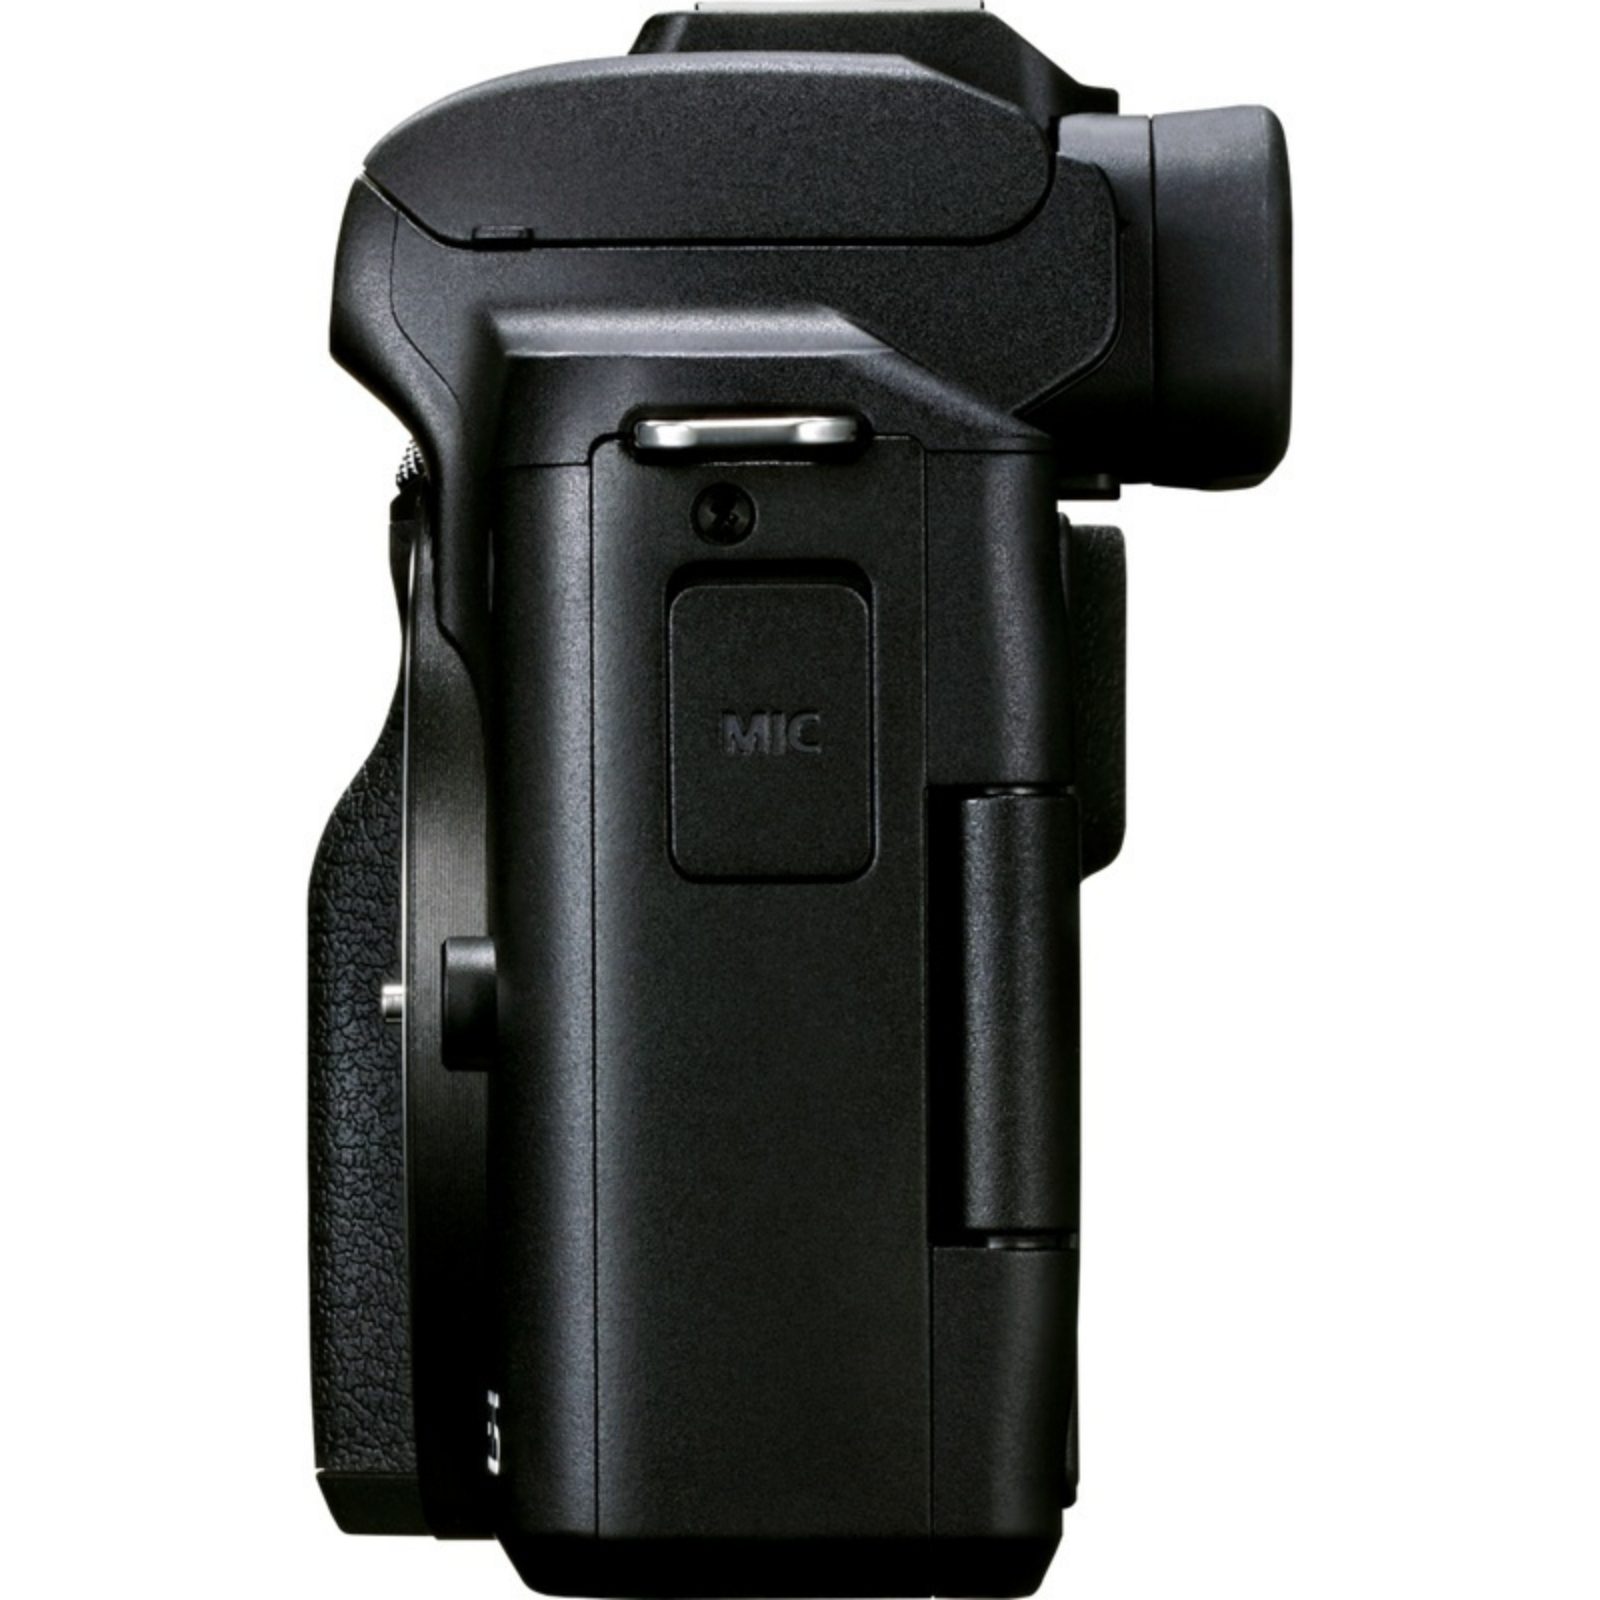 Canon キヤノン ミラーレス一眼カメラ EOS Kiss M2 ボディ ブラック 新品